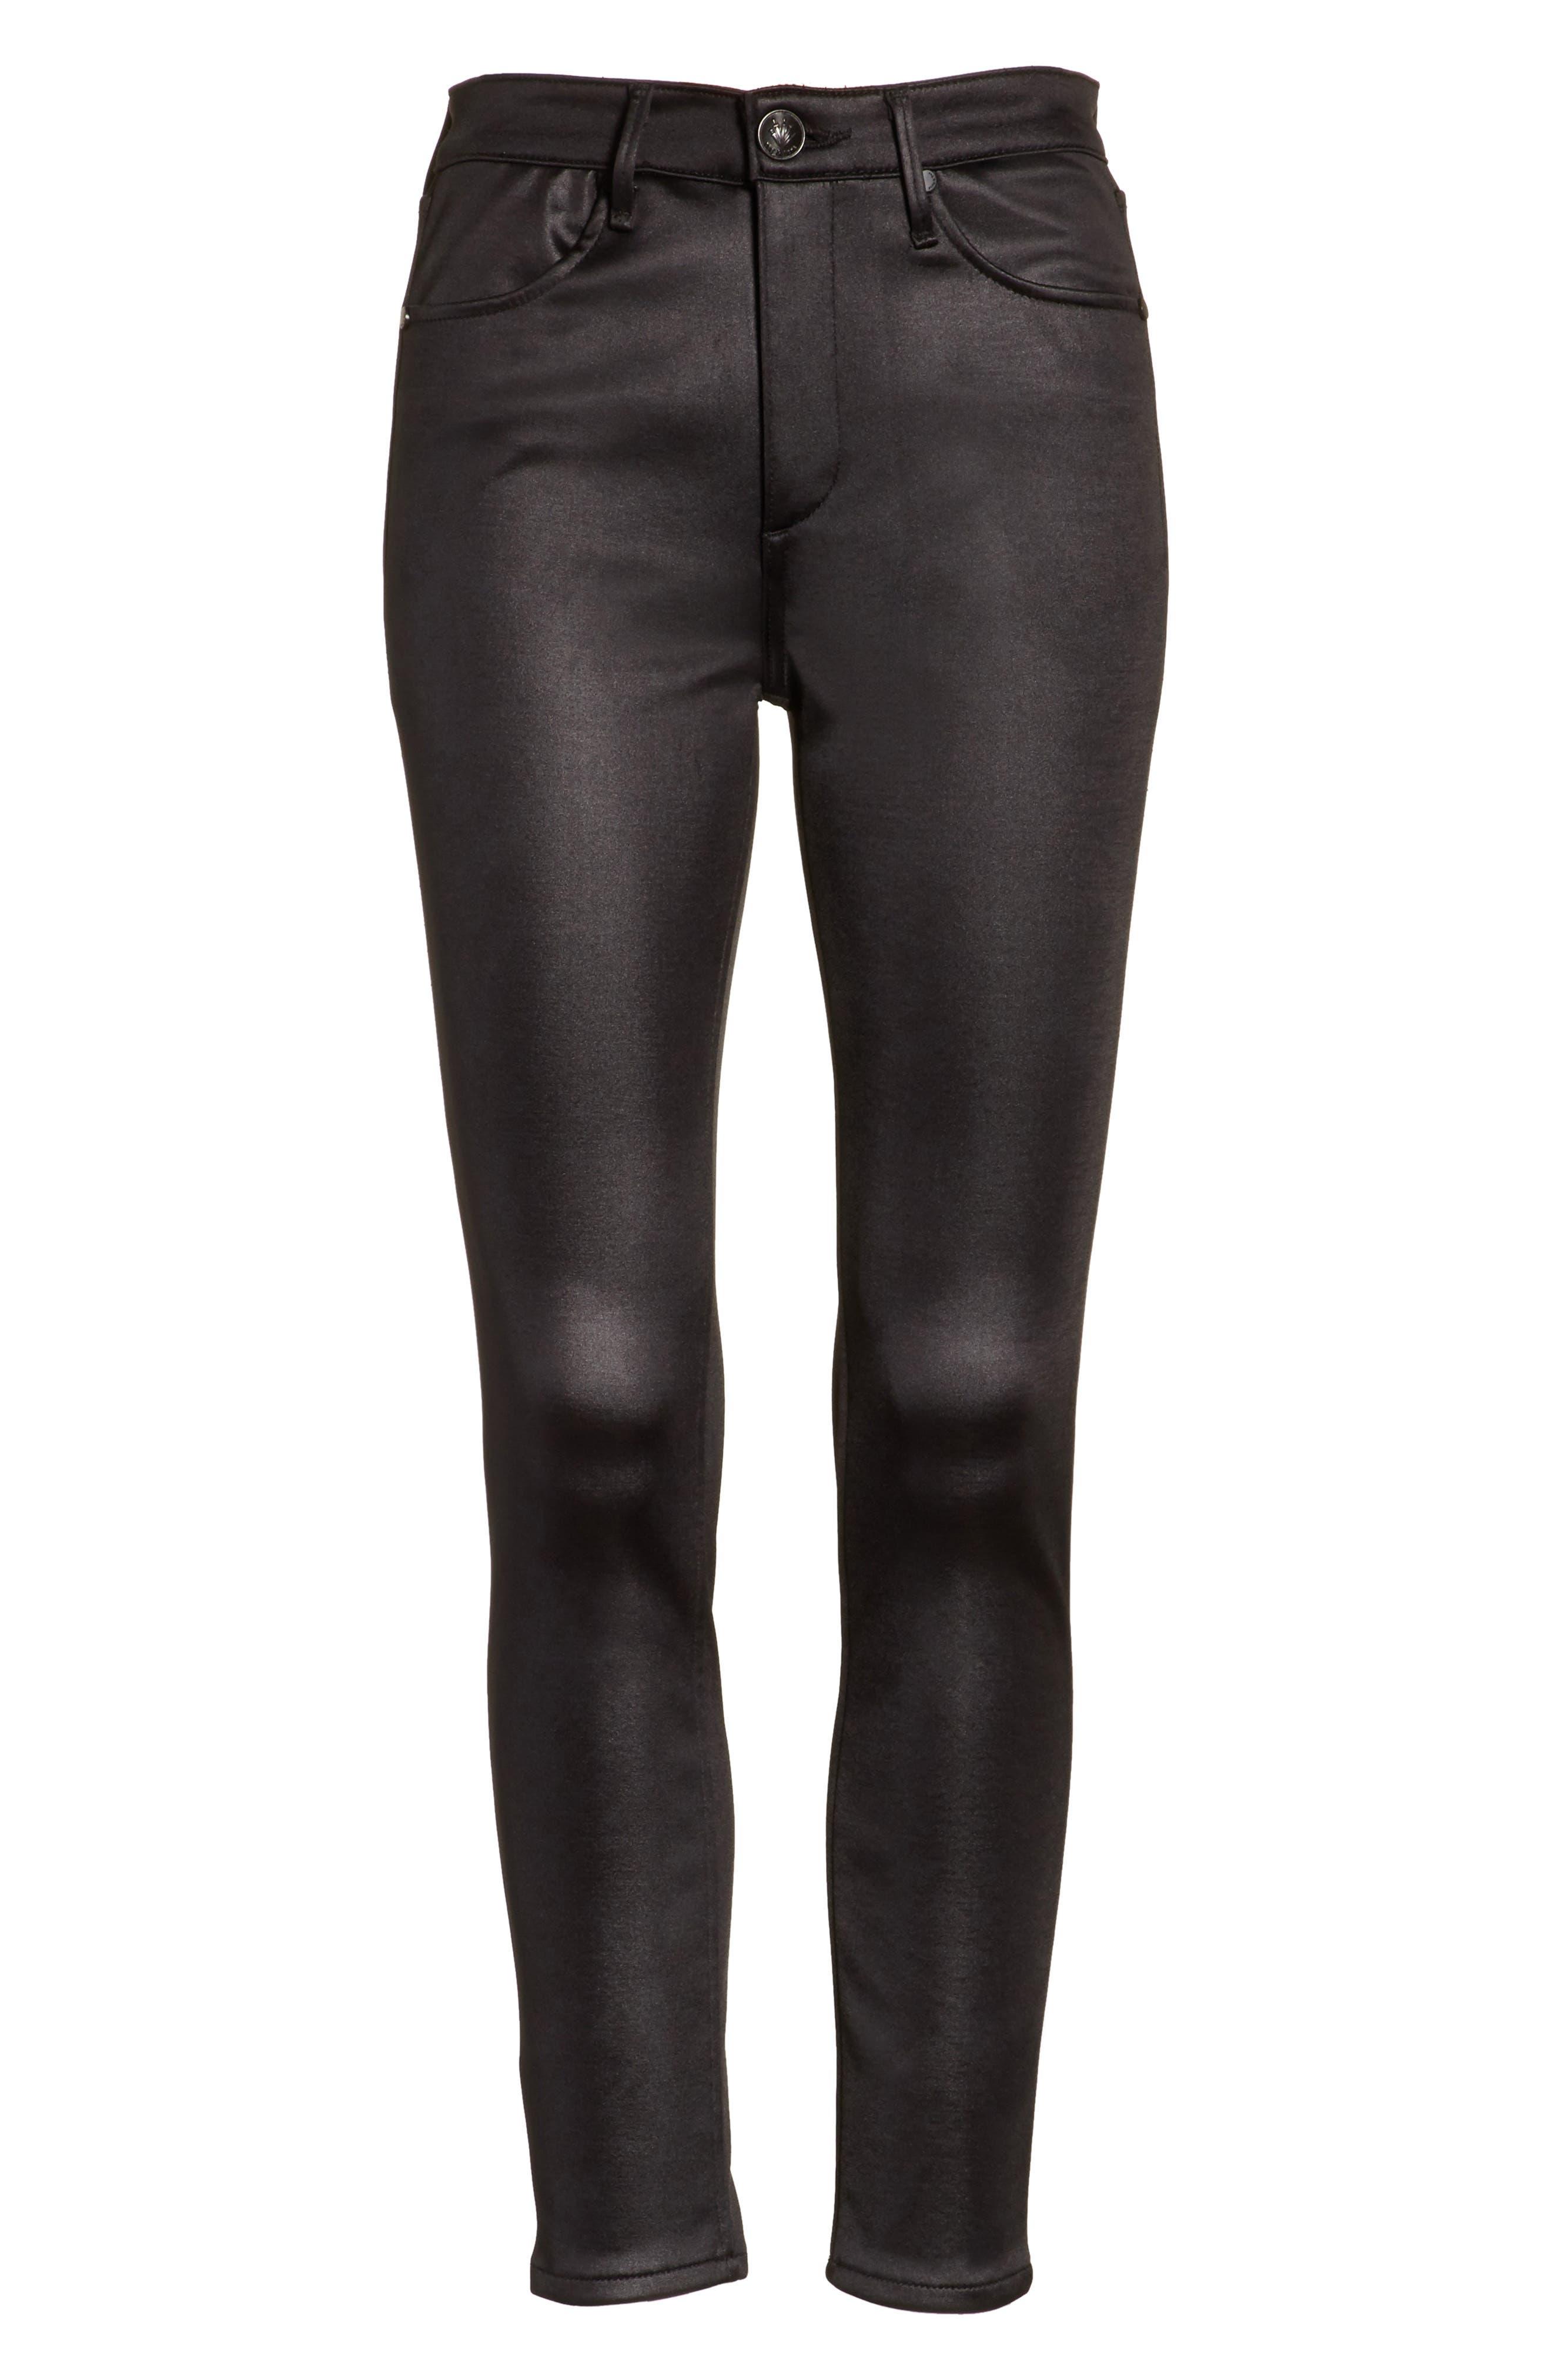 High Waist Ankle Skinny Jeans,                             Alternate thumbnail 6, color,                             Black Sateen